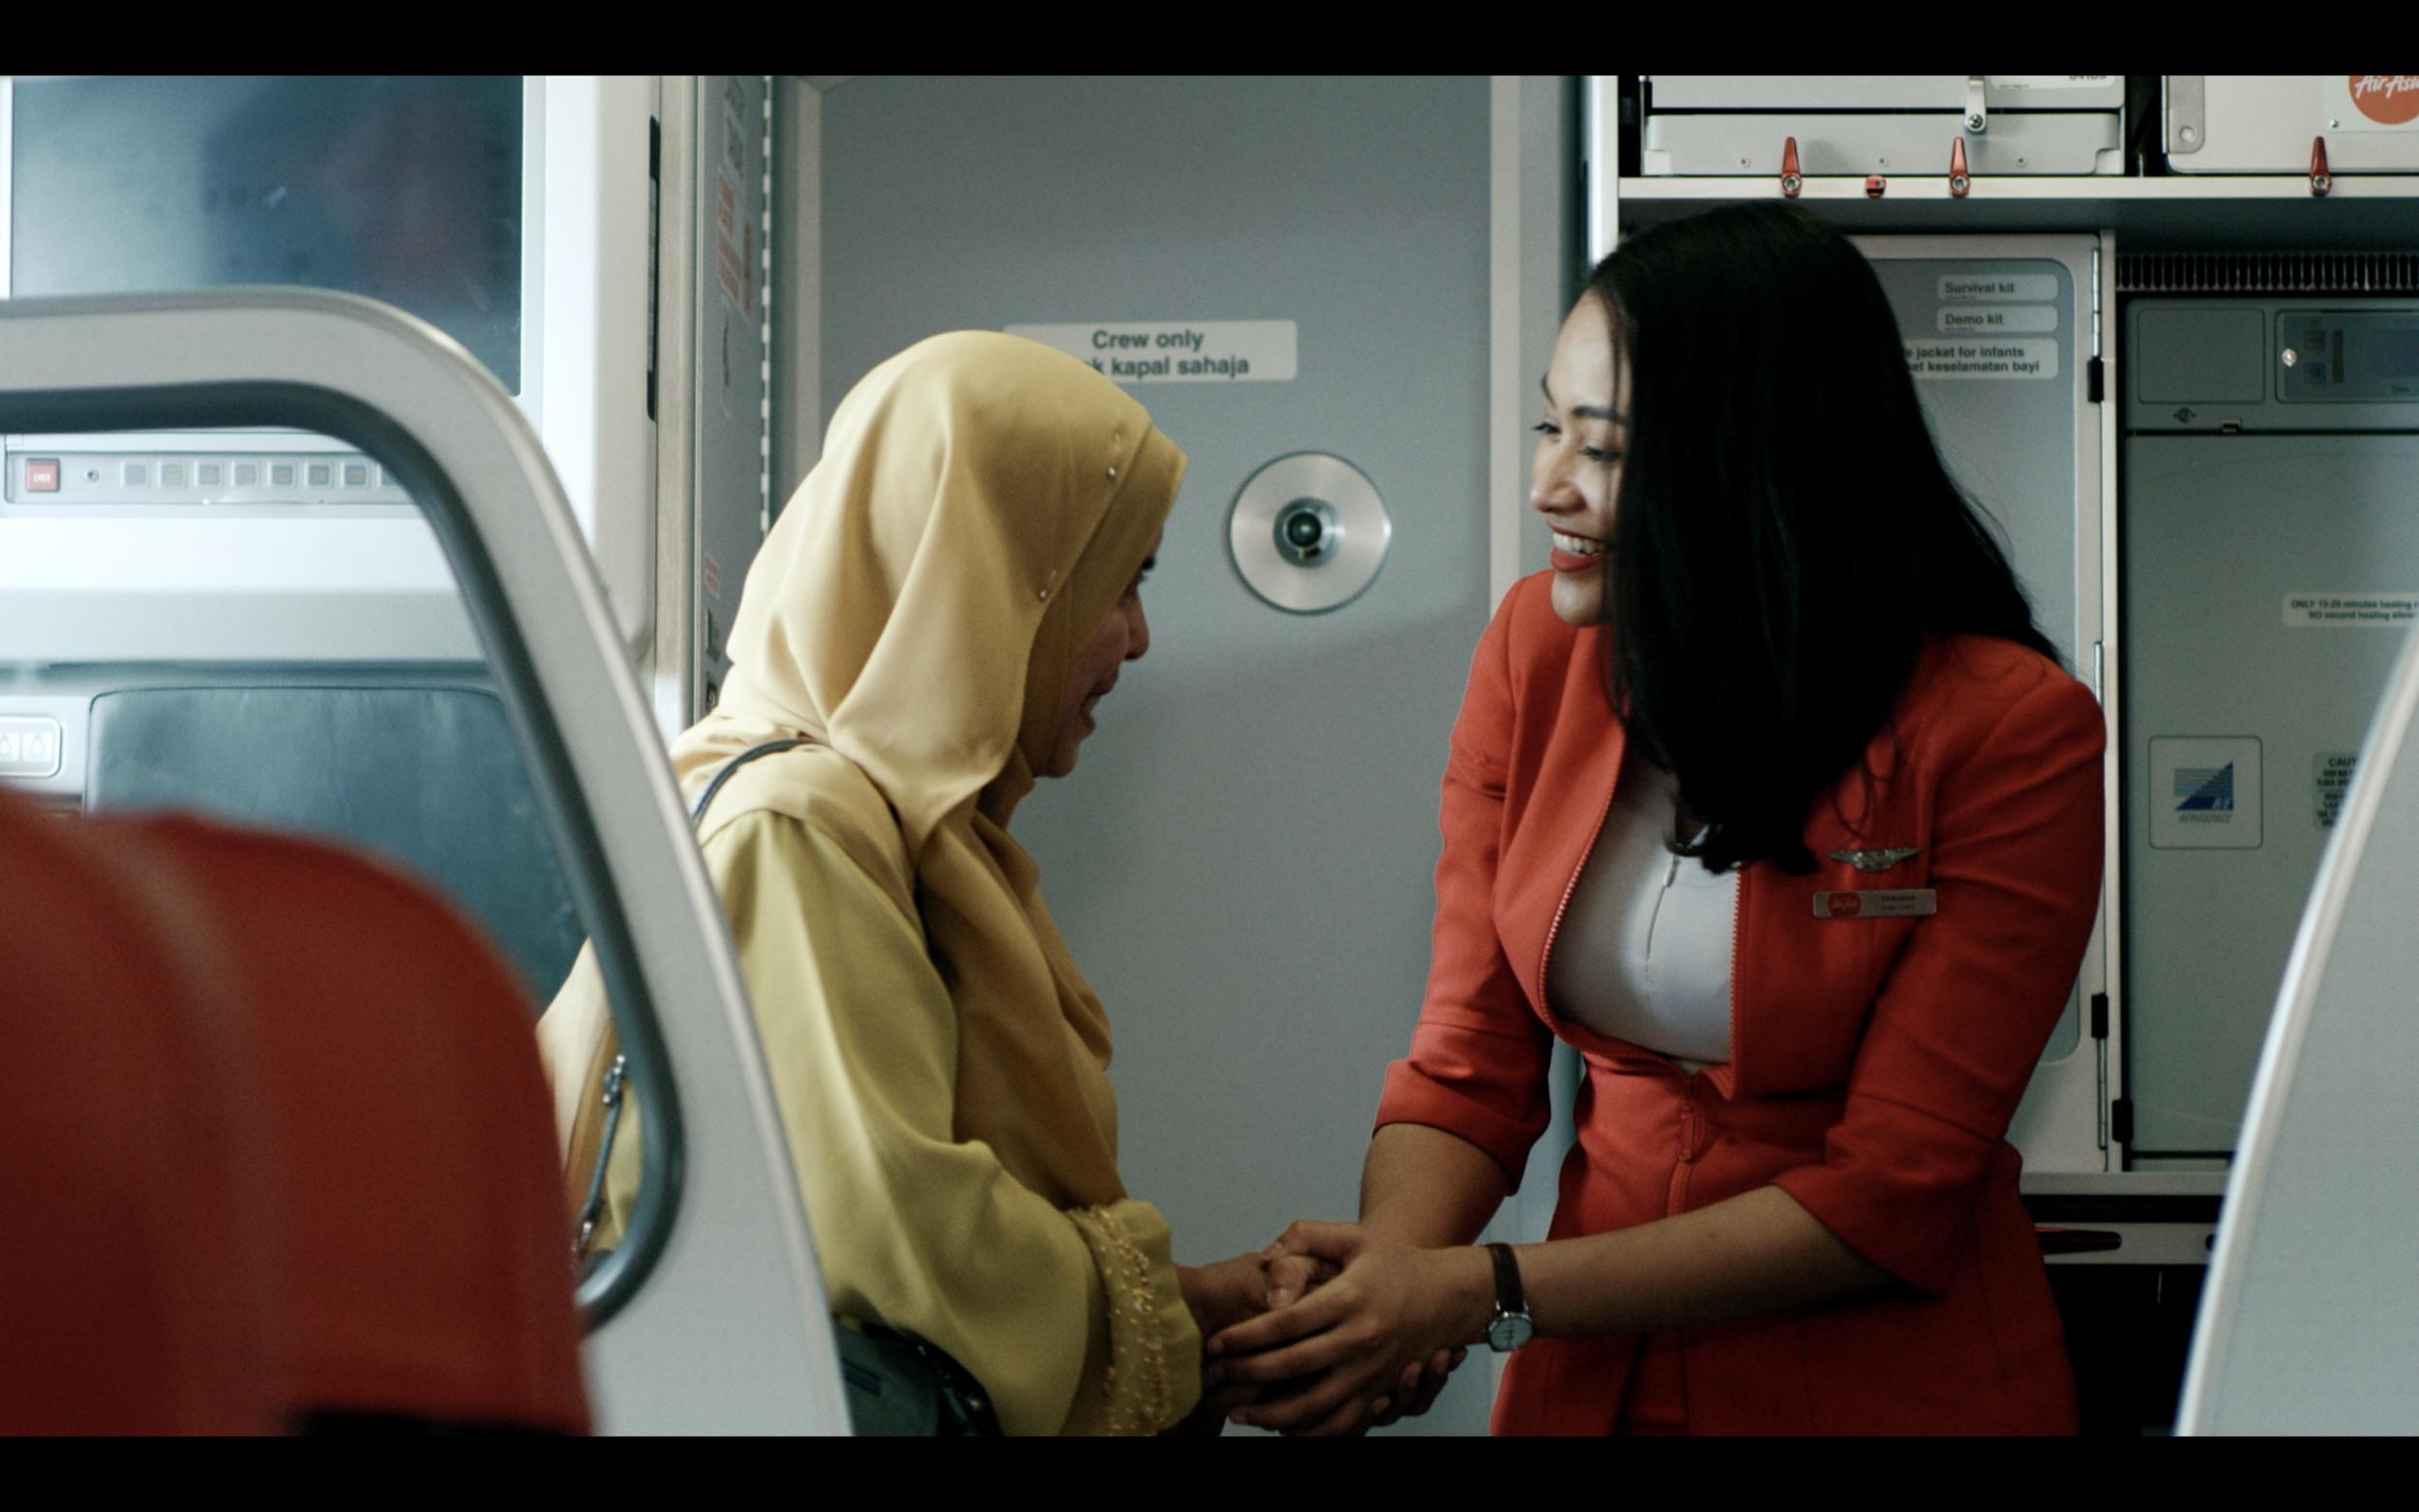 A scene from AirAsia Hari Raya Aidilfitri video.